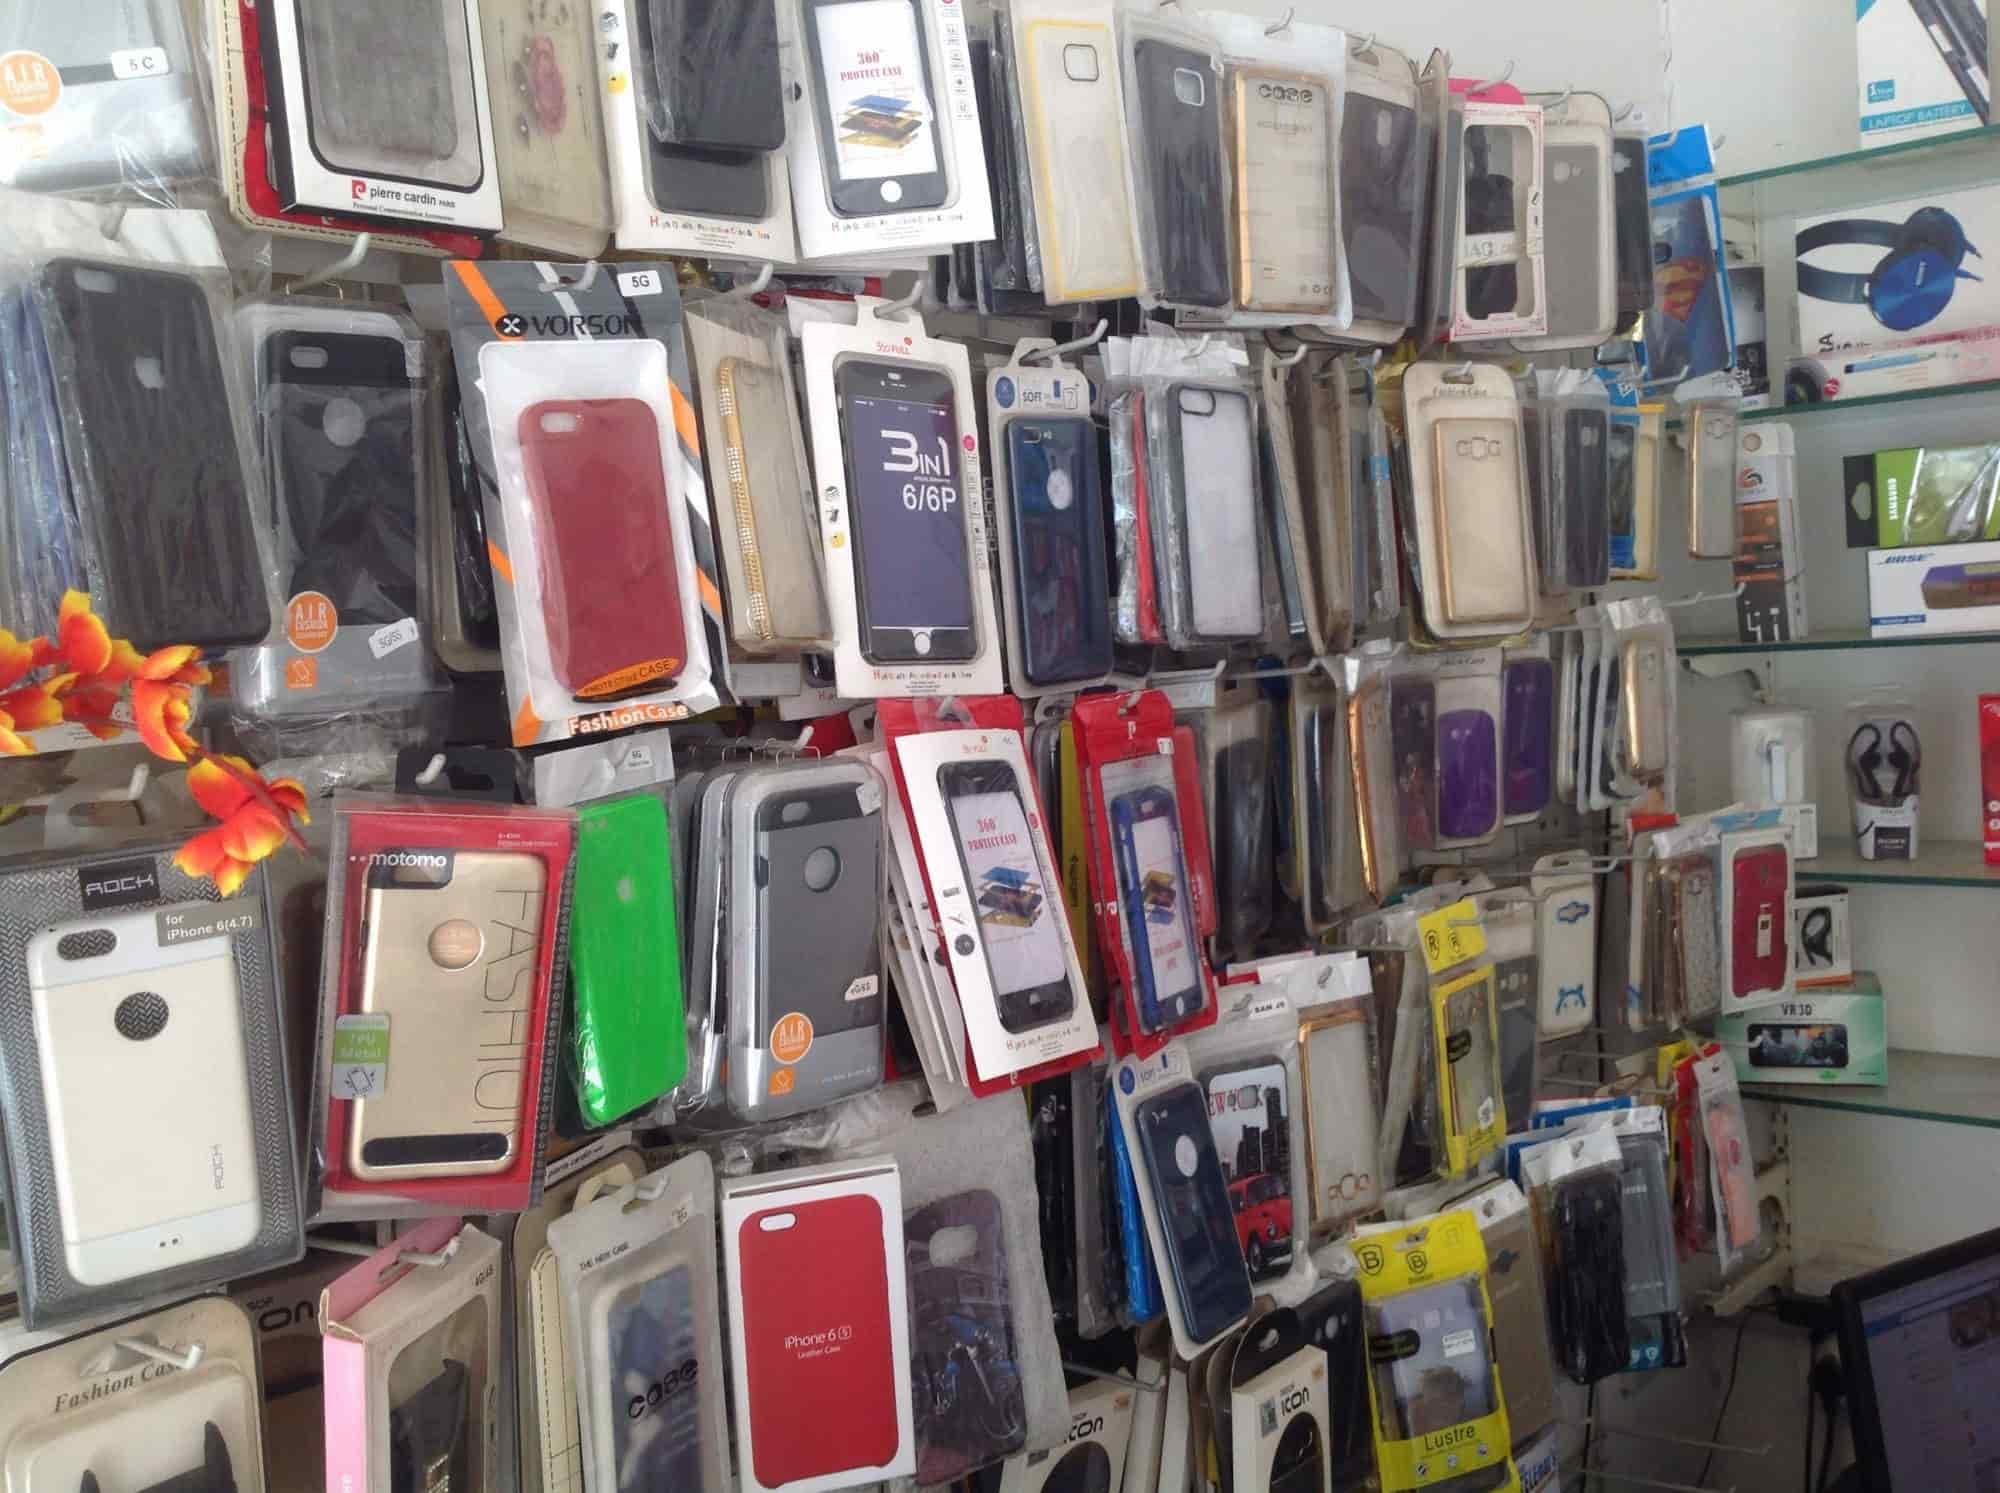 8e0a7d5ea0 Shakti Mobile World, Naranpura Vistar - Mobile Phone Dealers in Ahmedabad -  Justdial